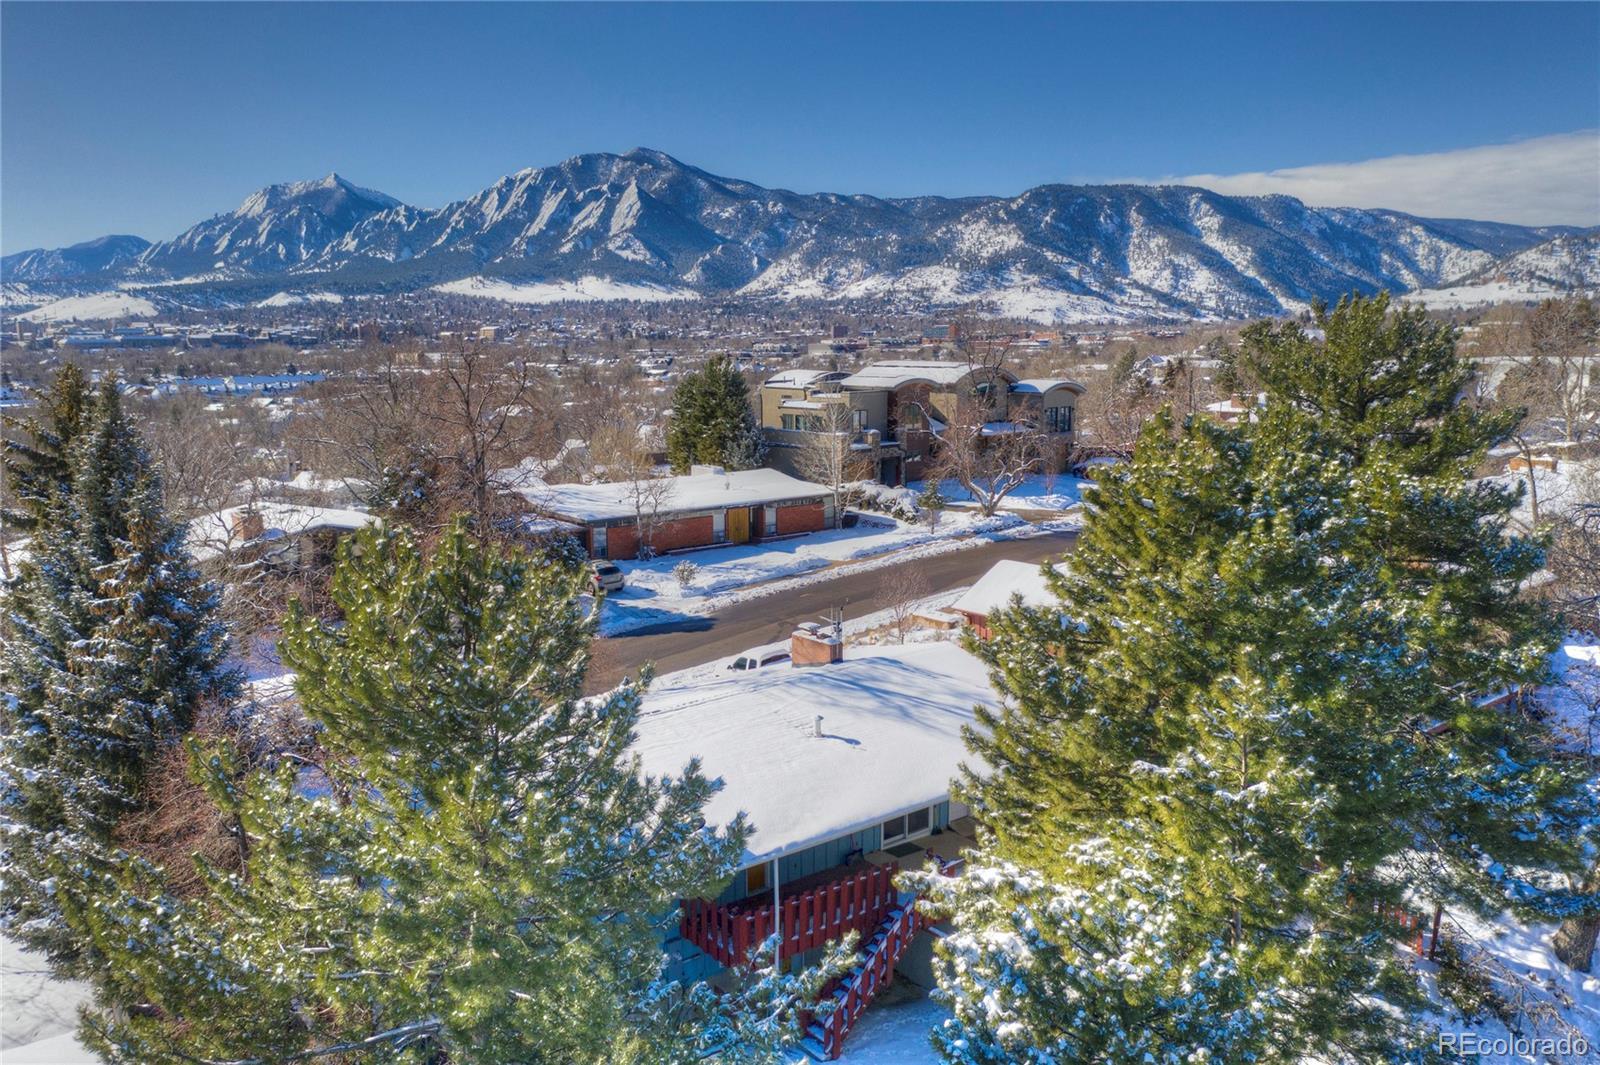 MLS# 3086362 - 2 - 2445 Balsam Drive, Boulder, CO 80304